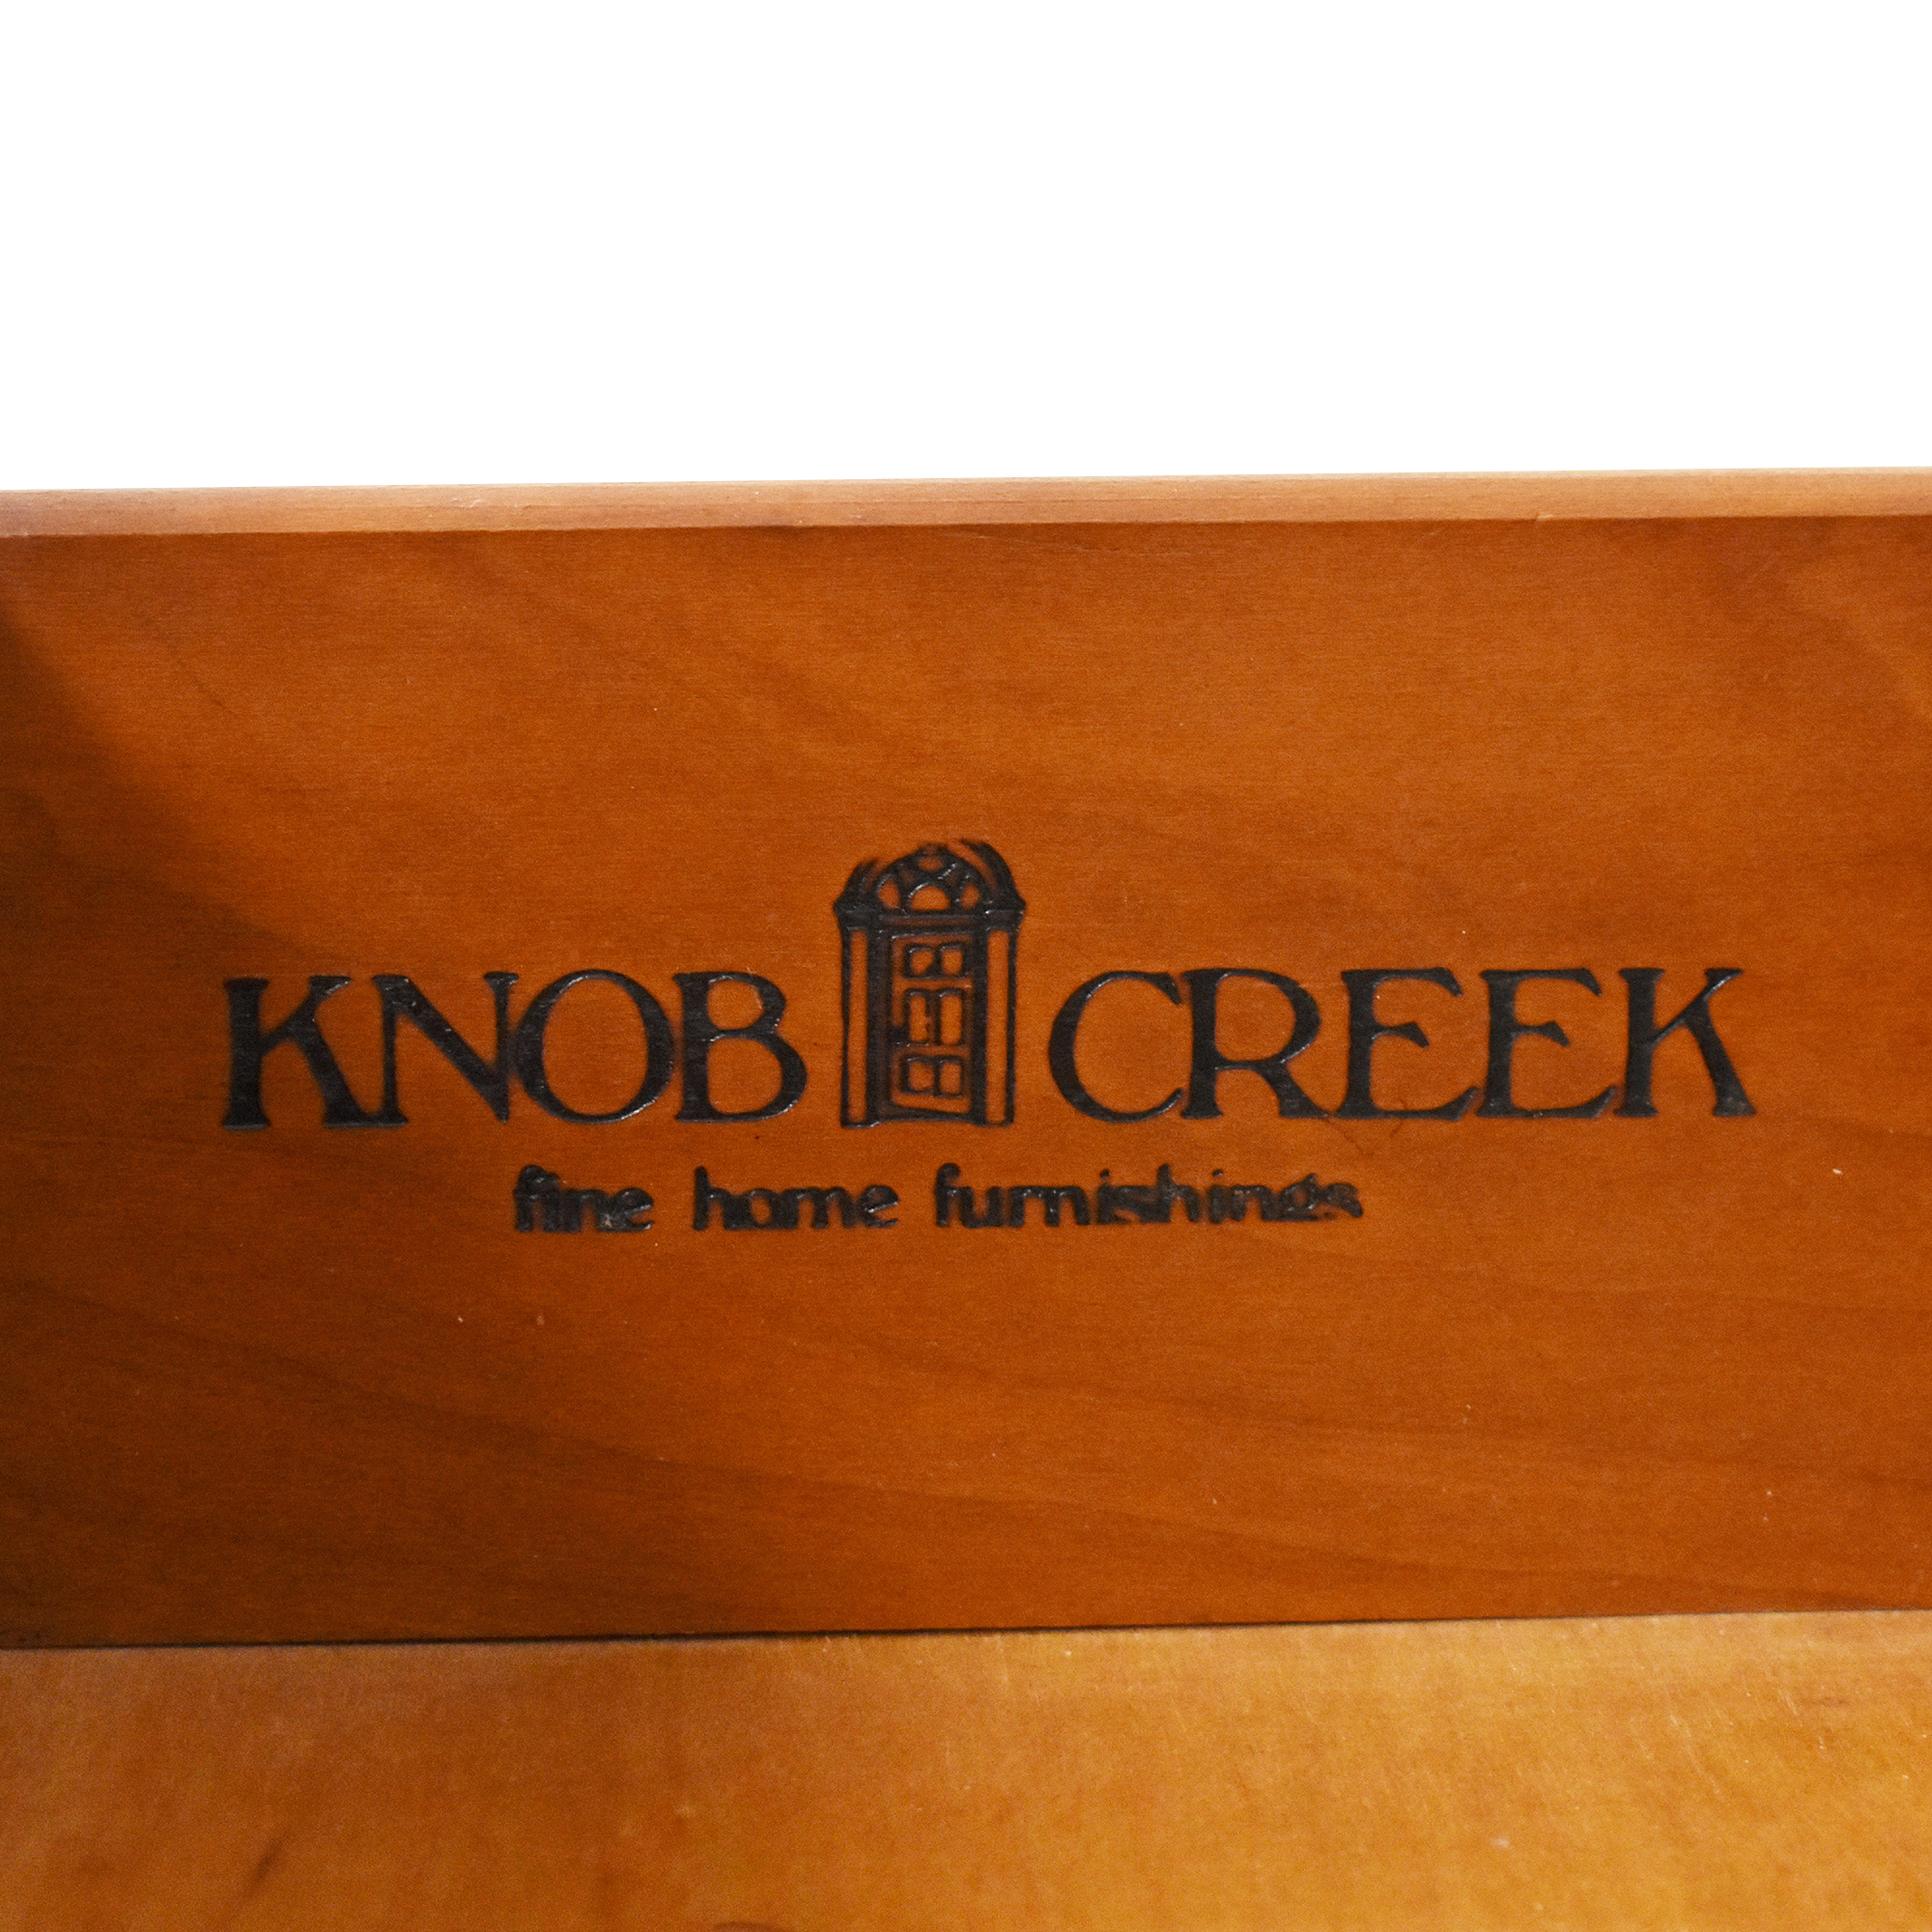 Knob Creek Two Drawer Nightstands Knob Creek